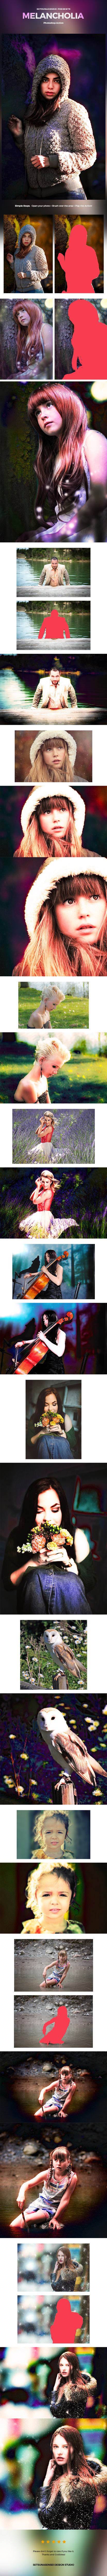 Melancholia Photoshop Action - Photo Effects Actions